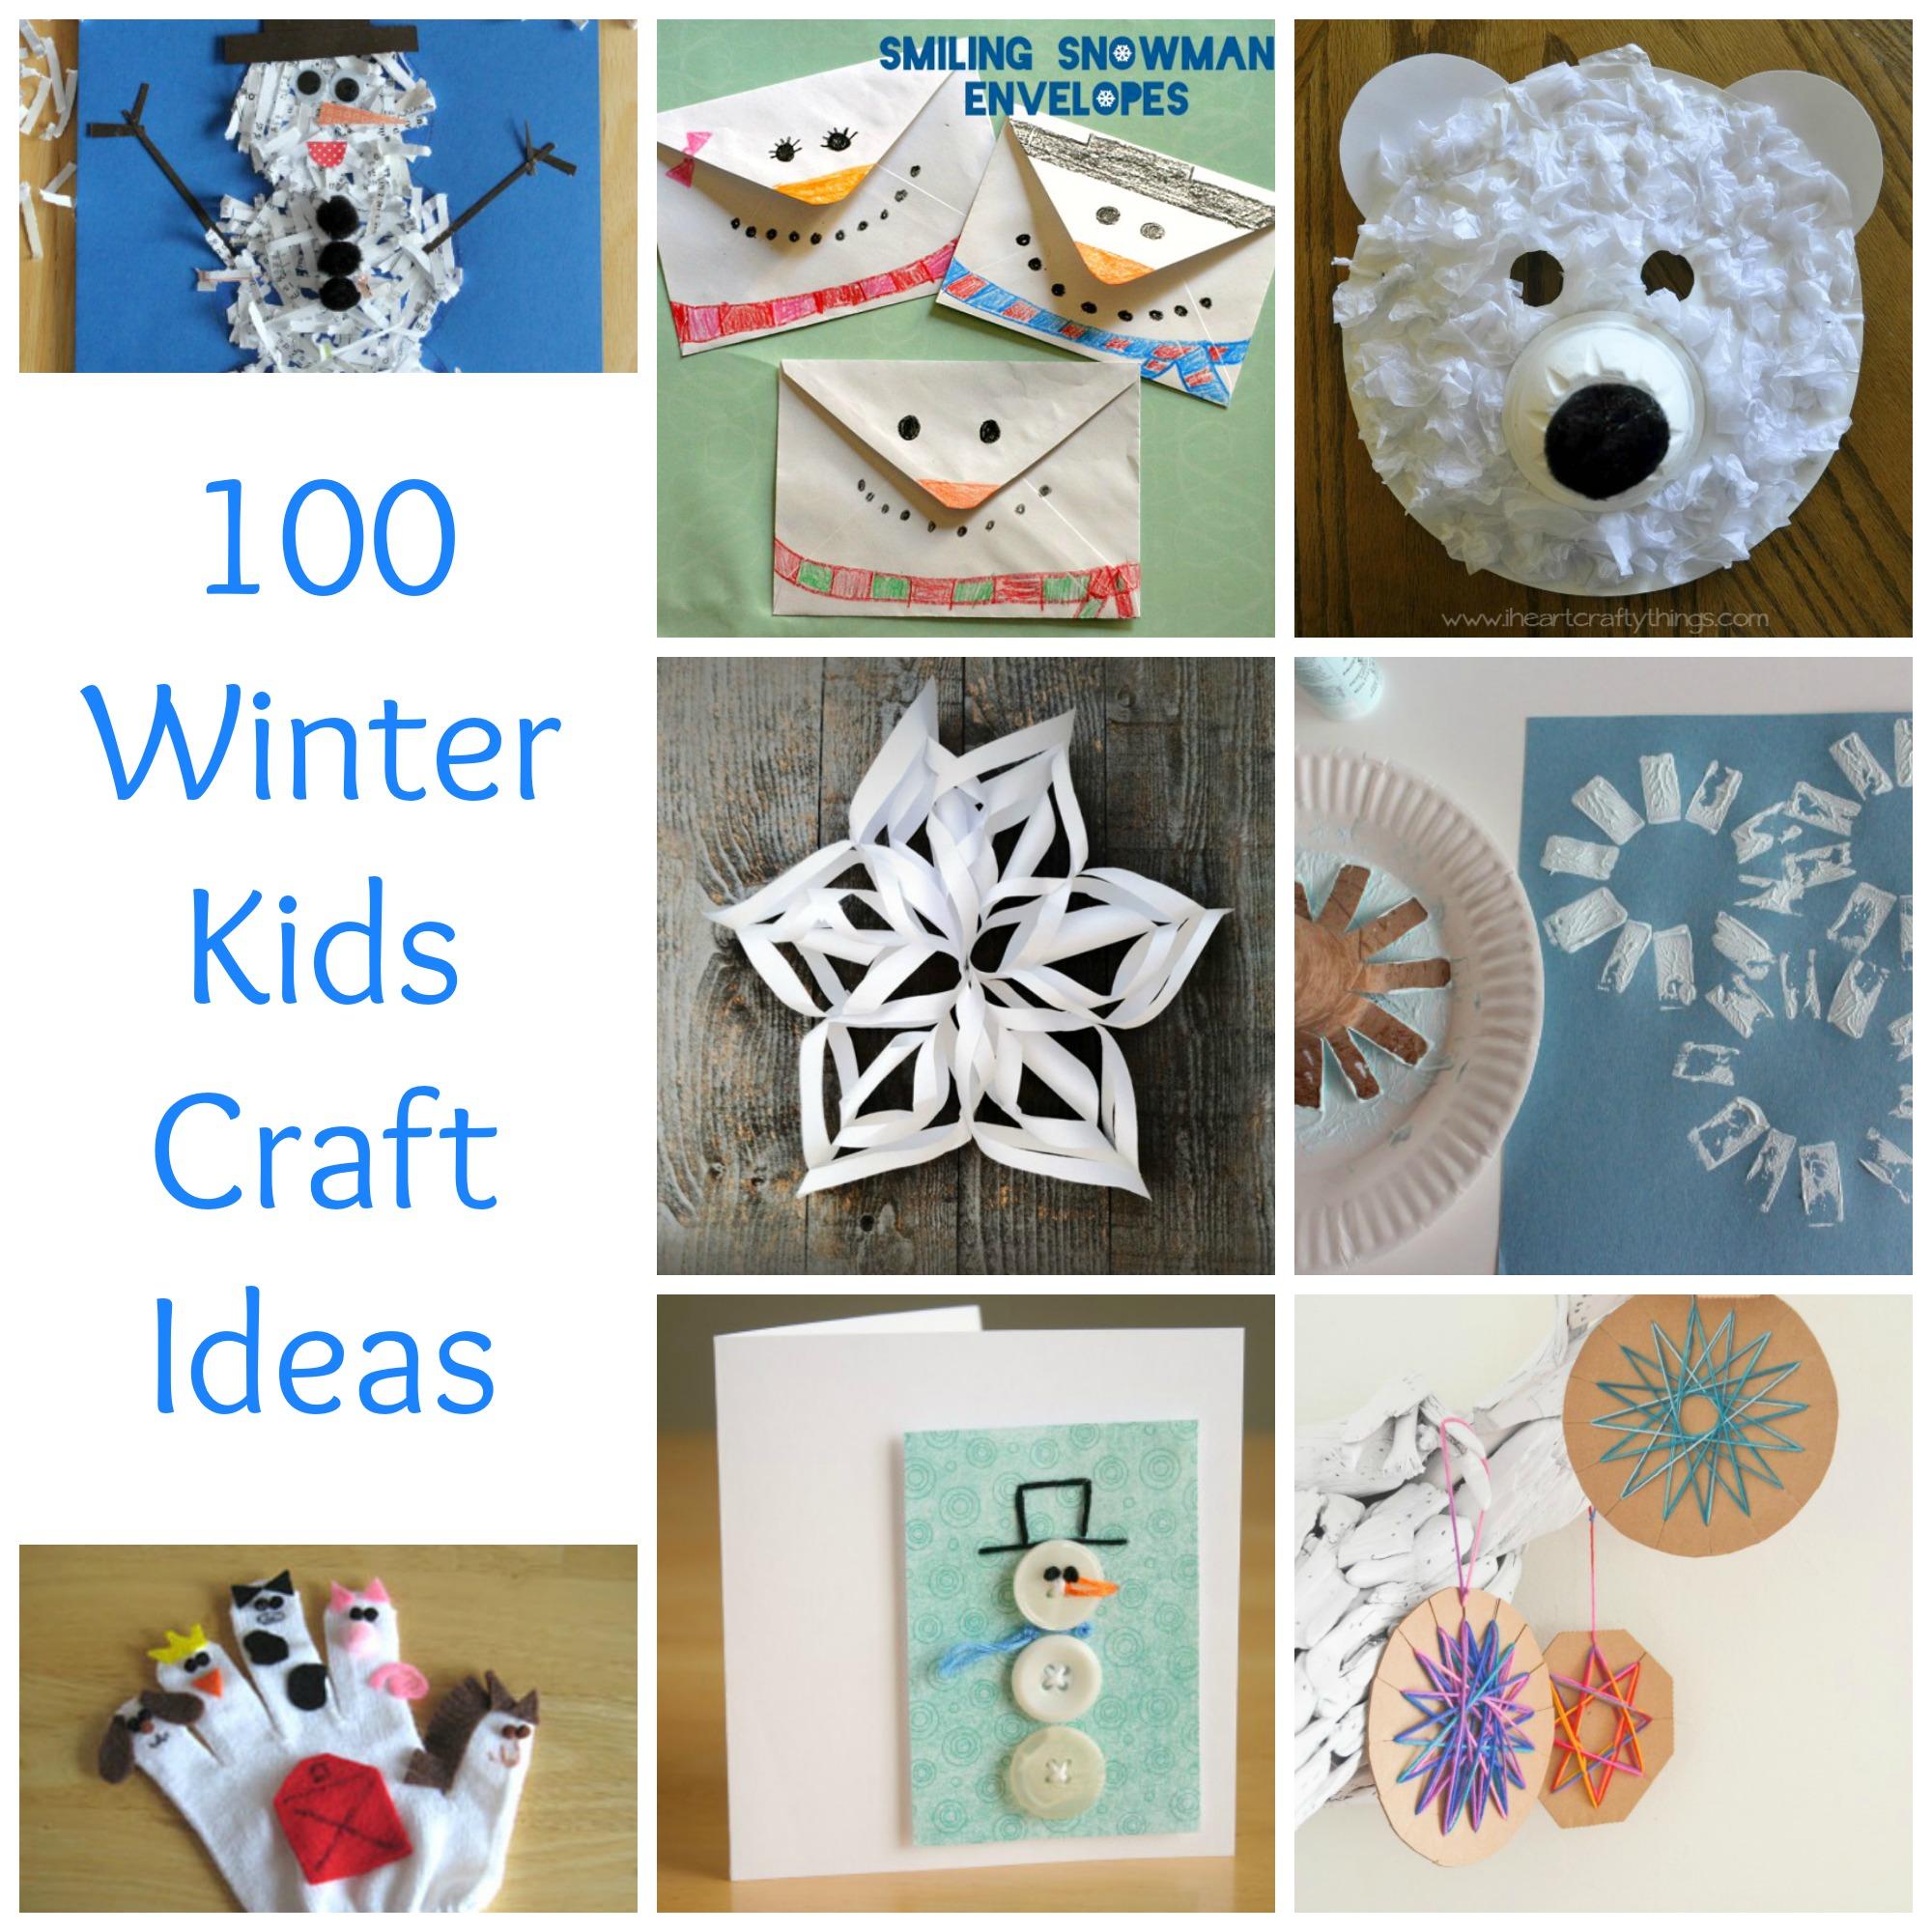 100 Winter Kids Craft Ideas